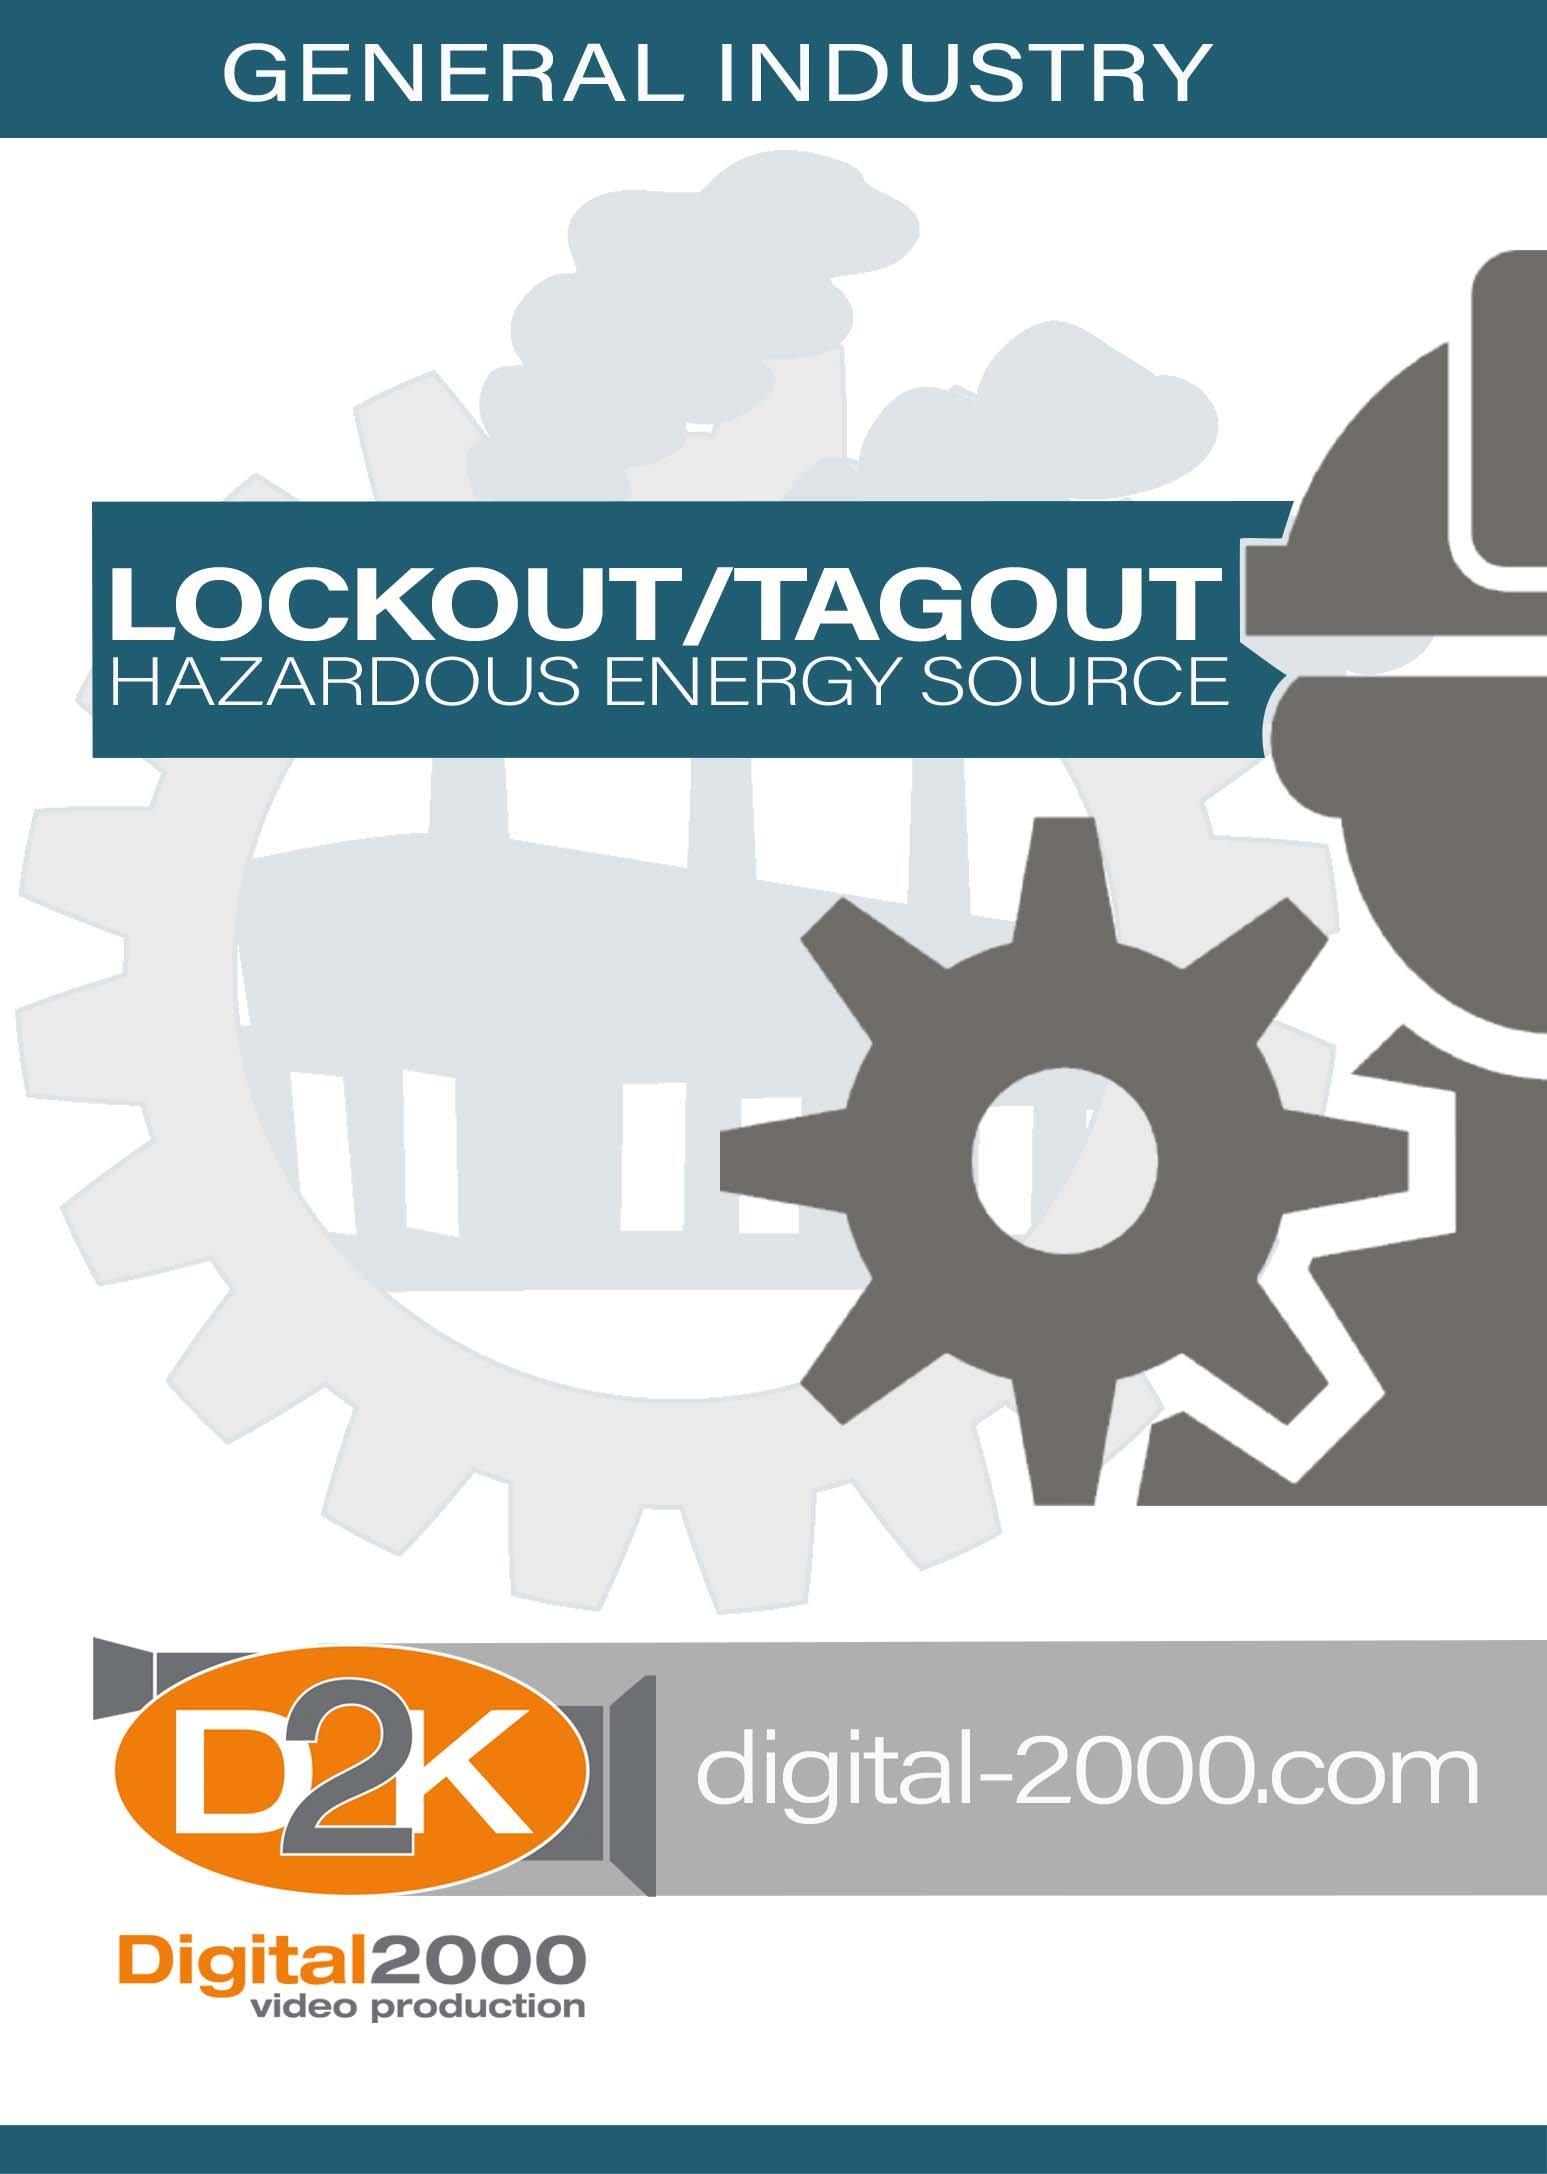 Lockout/Tagout - Hazardous Energy Source (Manufacturing) Safety Training DVD